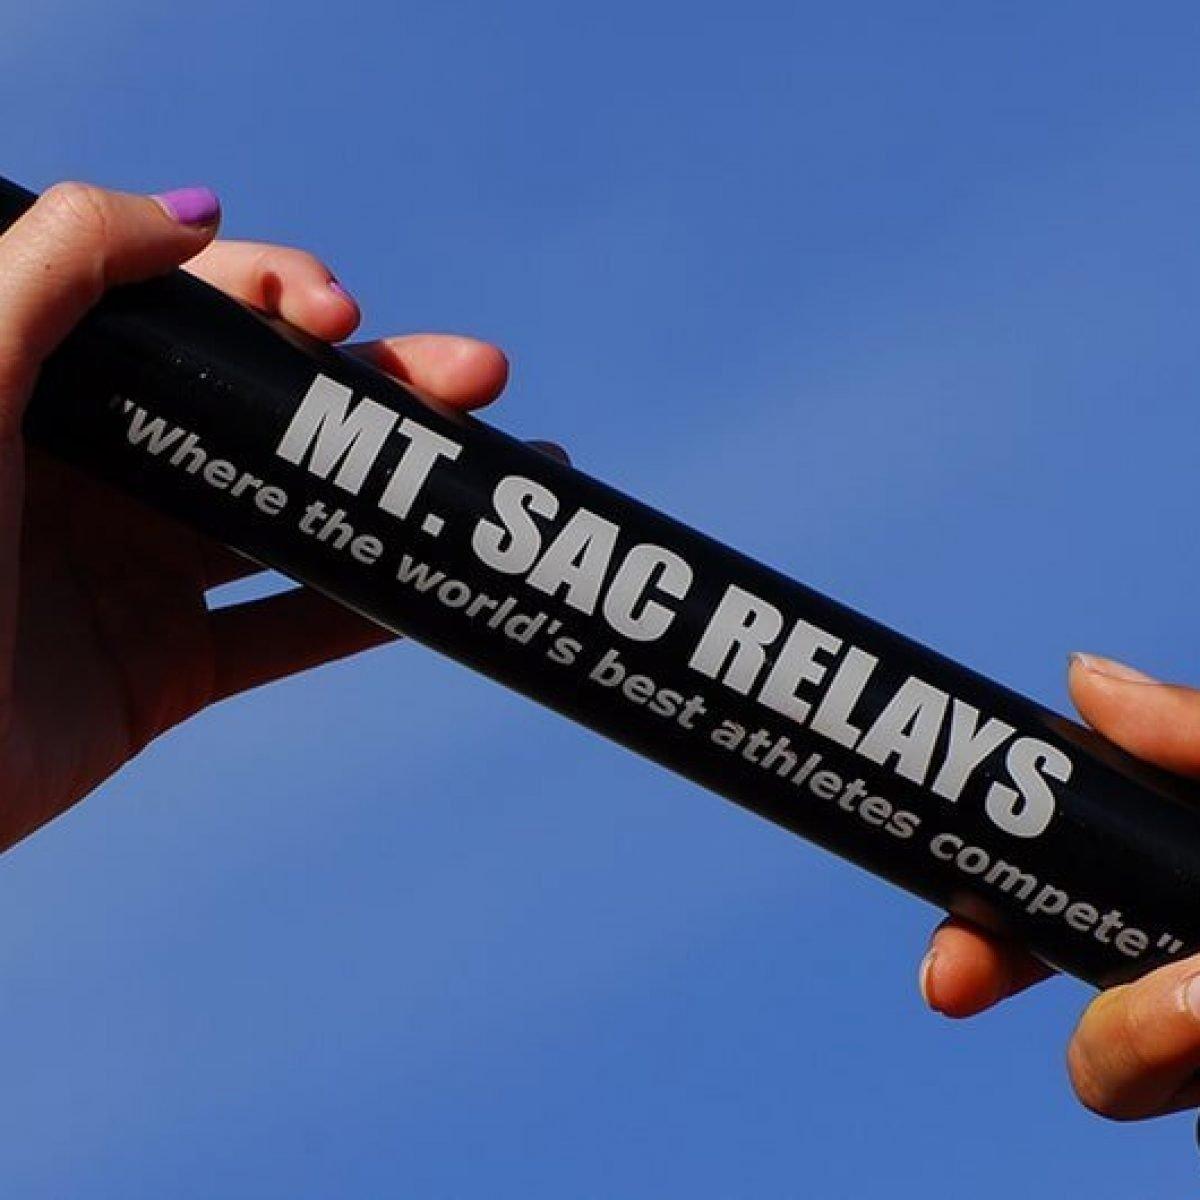 relay baton (RelayBatons.com)